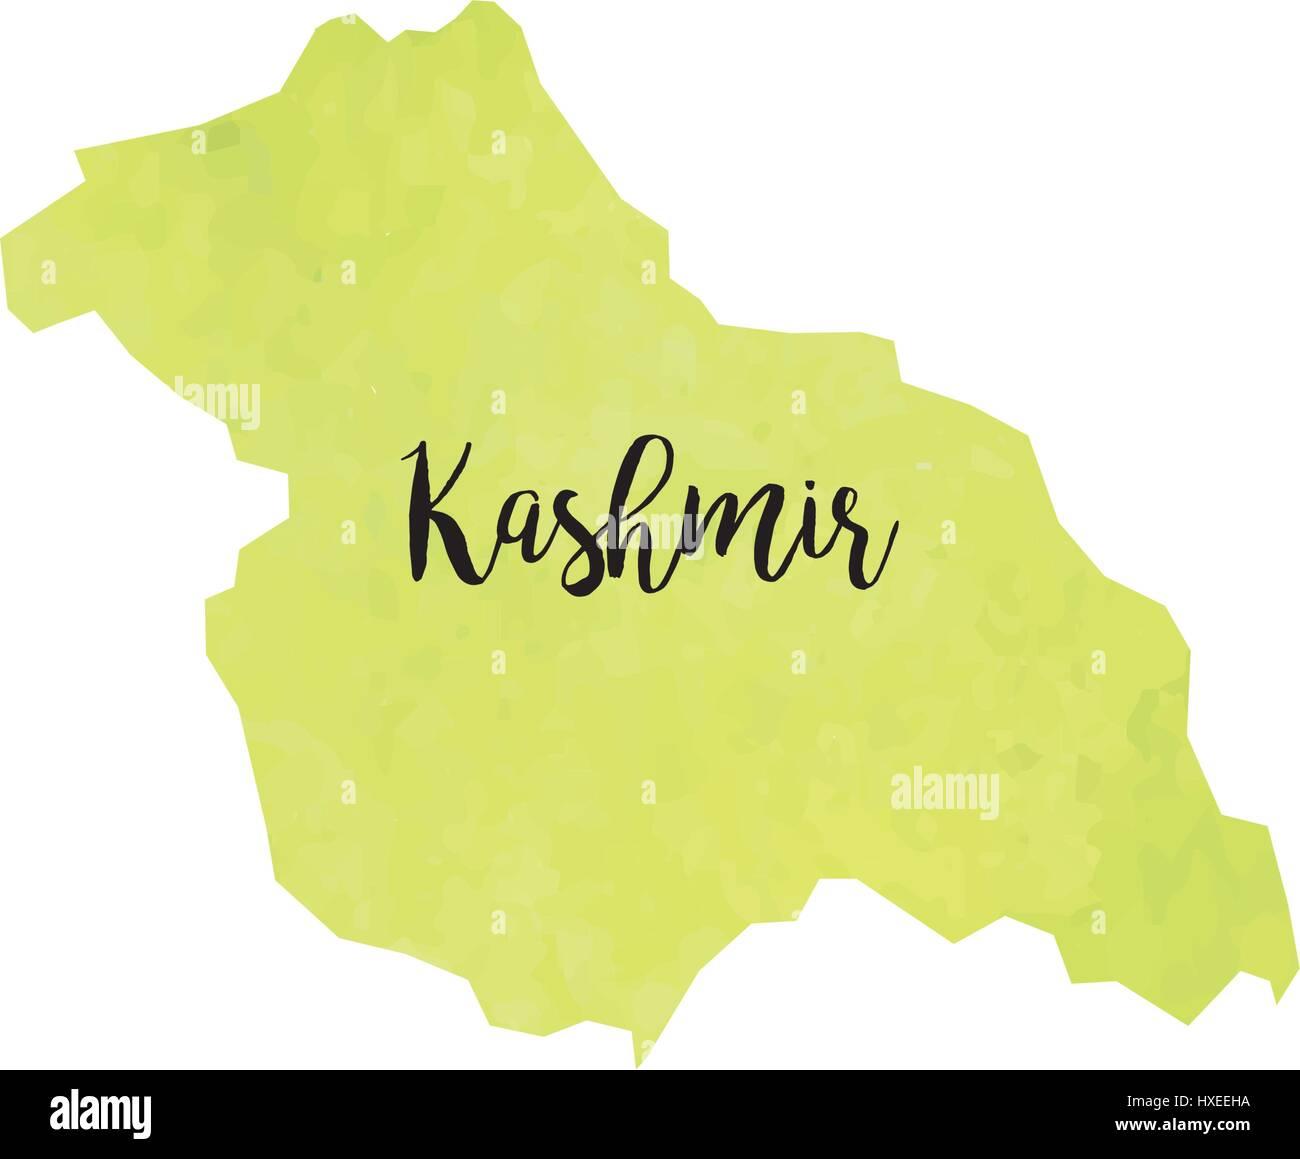 Kashmir Map Stock Photos & Kashmir Map Stock Images - Alamy on fata map, khyber pass map, thar desert map, pakistan map, bhutan map, ganges river map, azad kashmir, line of control map, sikh map, punjab map, brahmaputra river map, wakhan corridor map, indus river, ladakh map, kashmiri people, india map, sri lanka map, aksai chin, jammu and kashmir, indus river map, kurdistan map, asia map, deccan plateau map, bangalore map, siachen map,